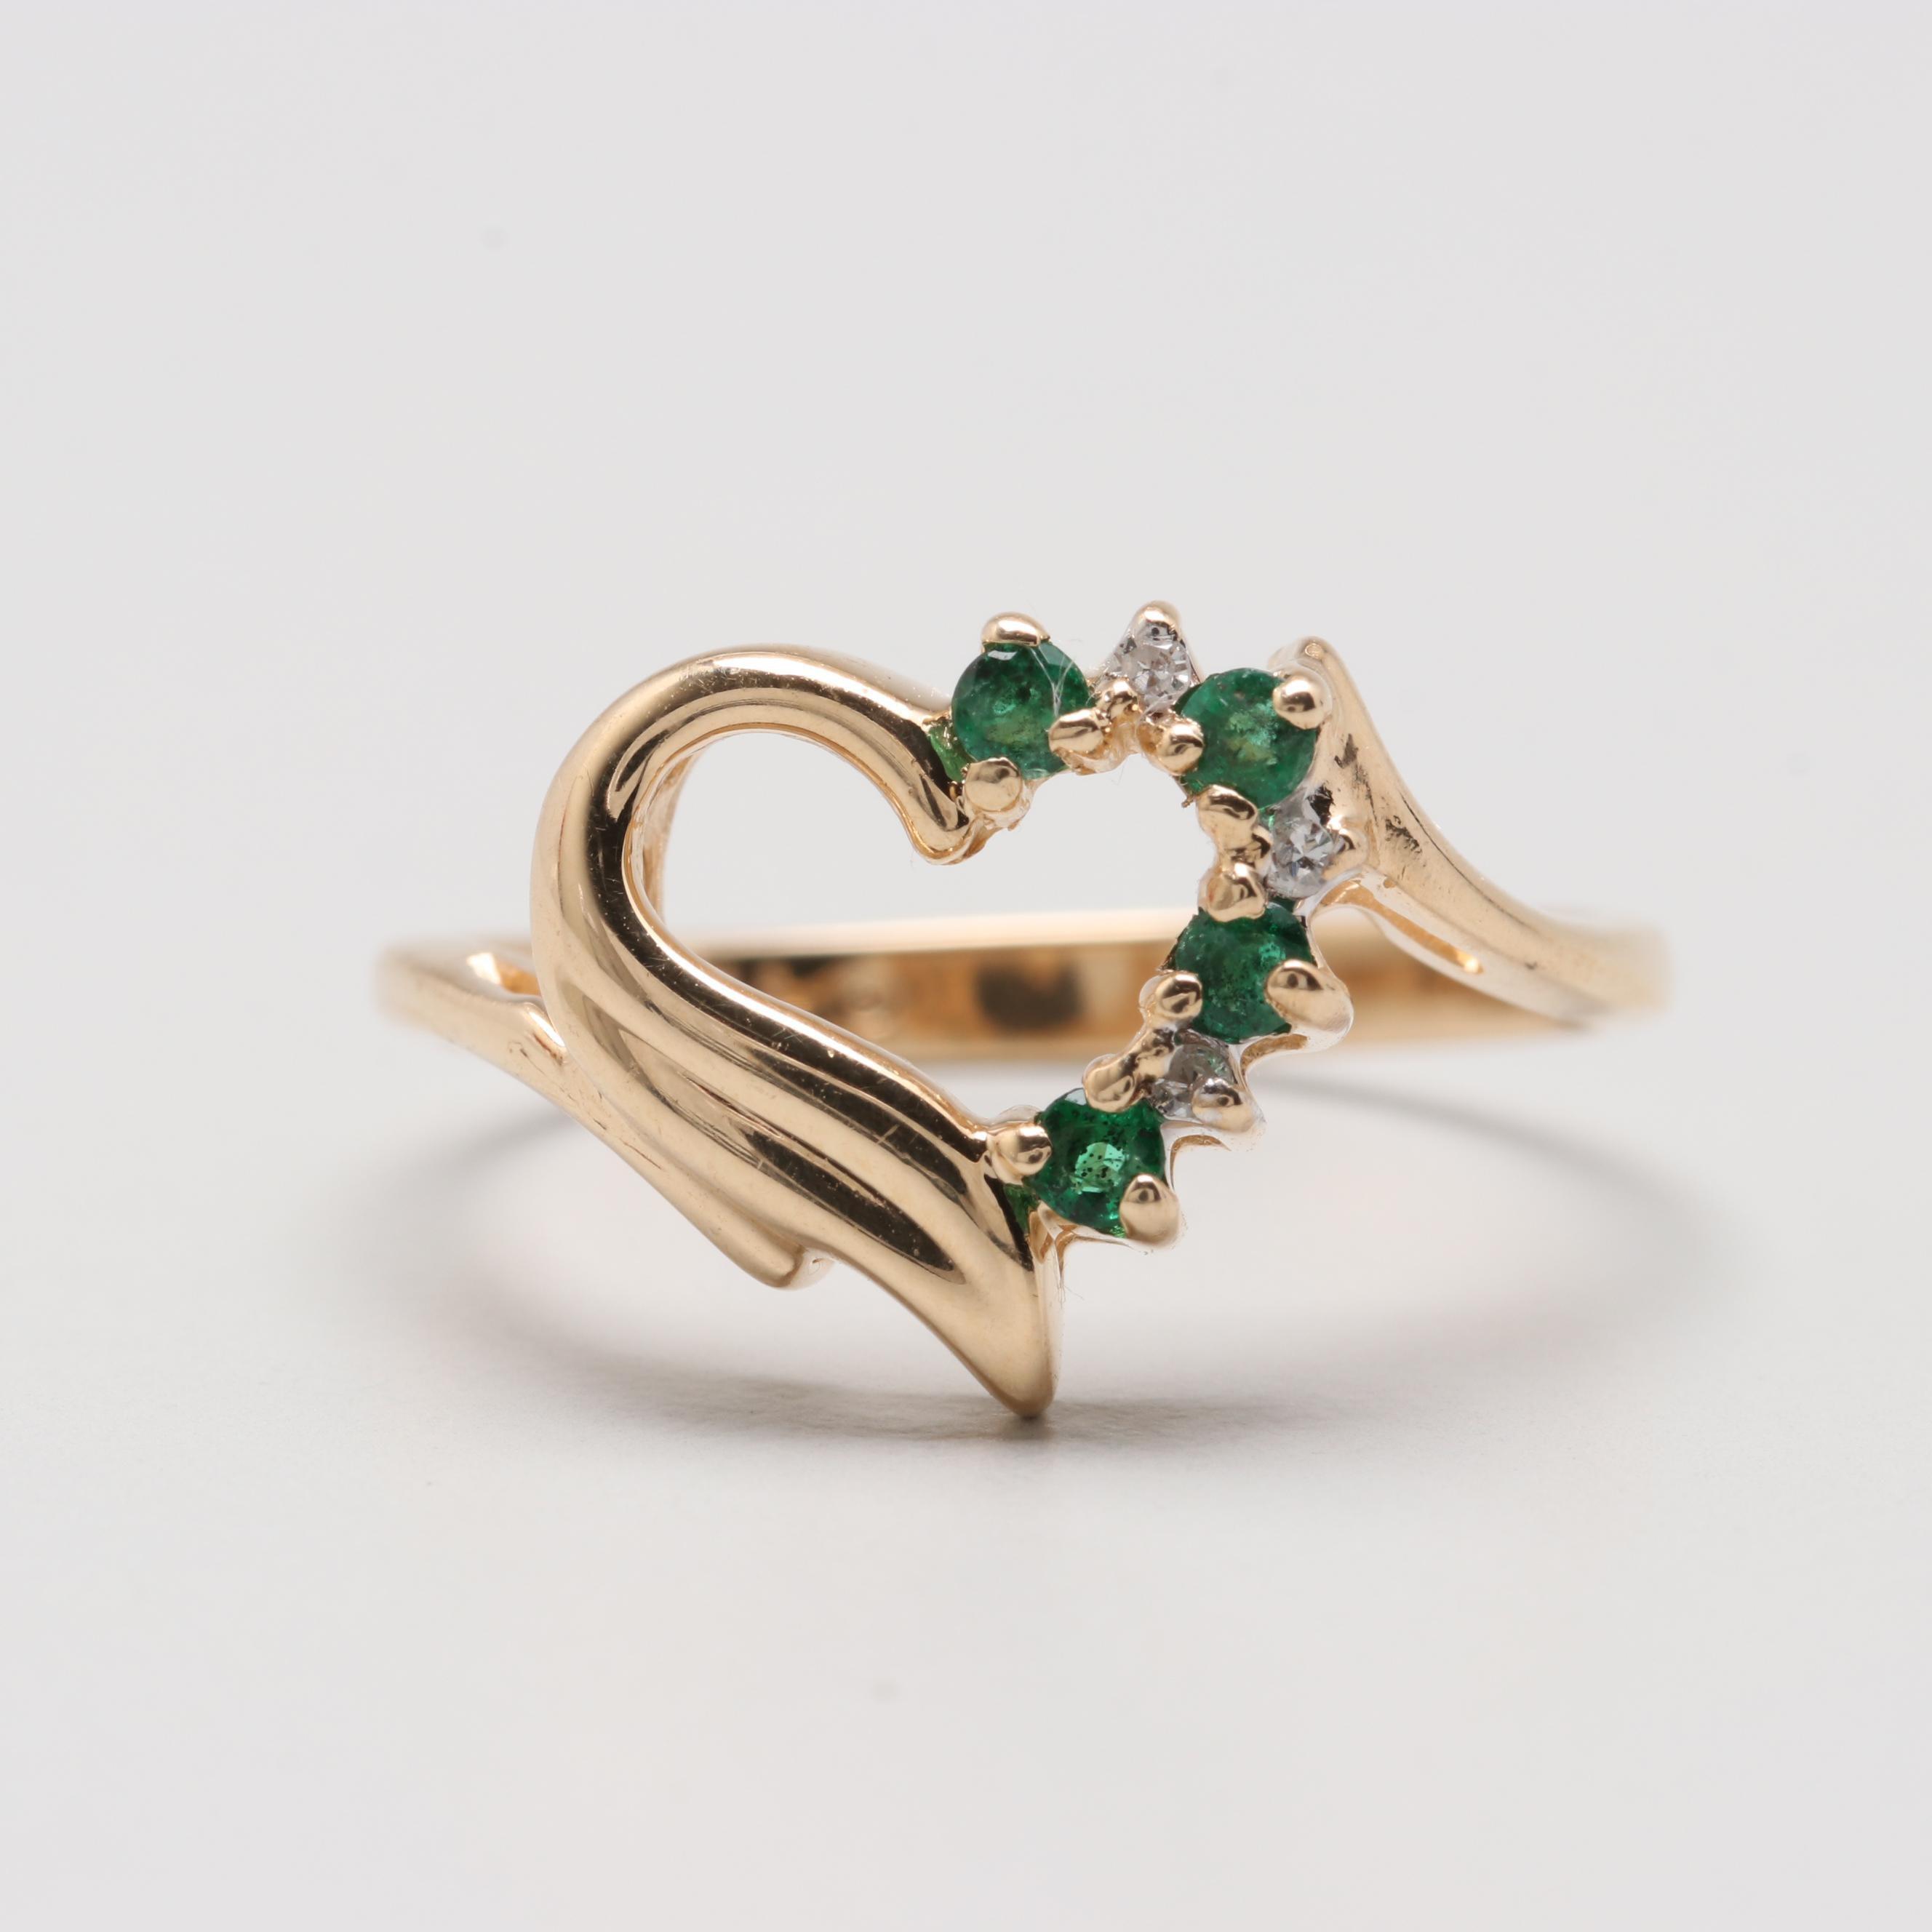 Alwand Vahan 14K Yellow Gold Emerald and Diamond Heart Ring